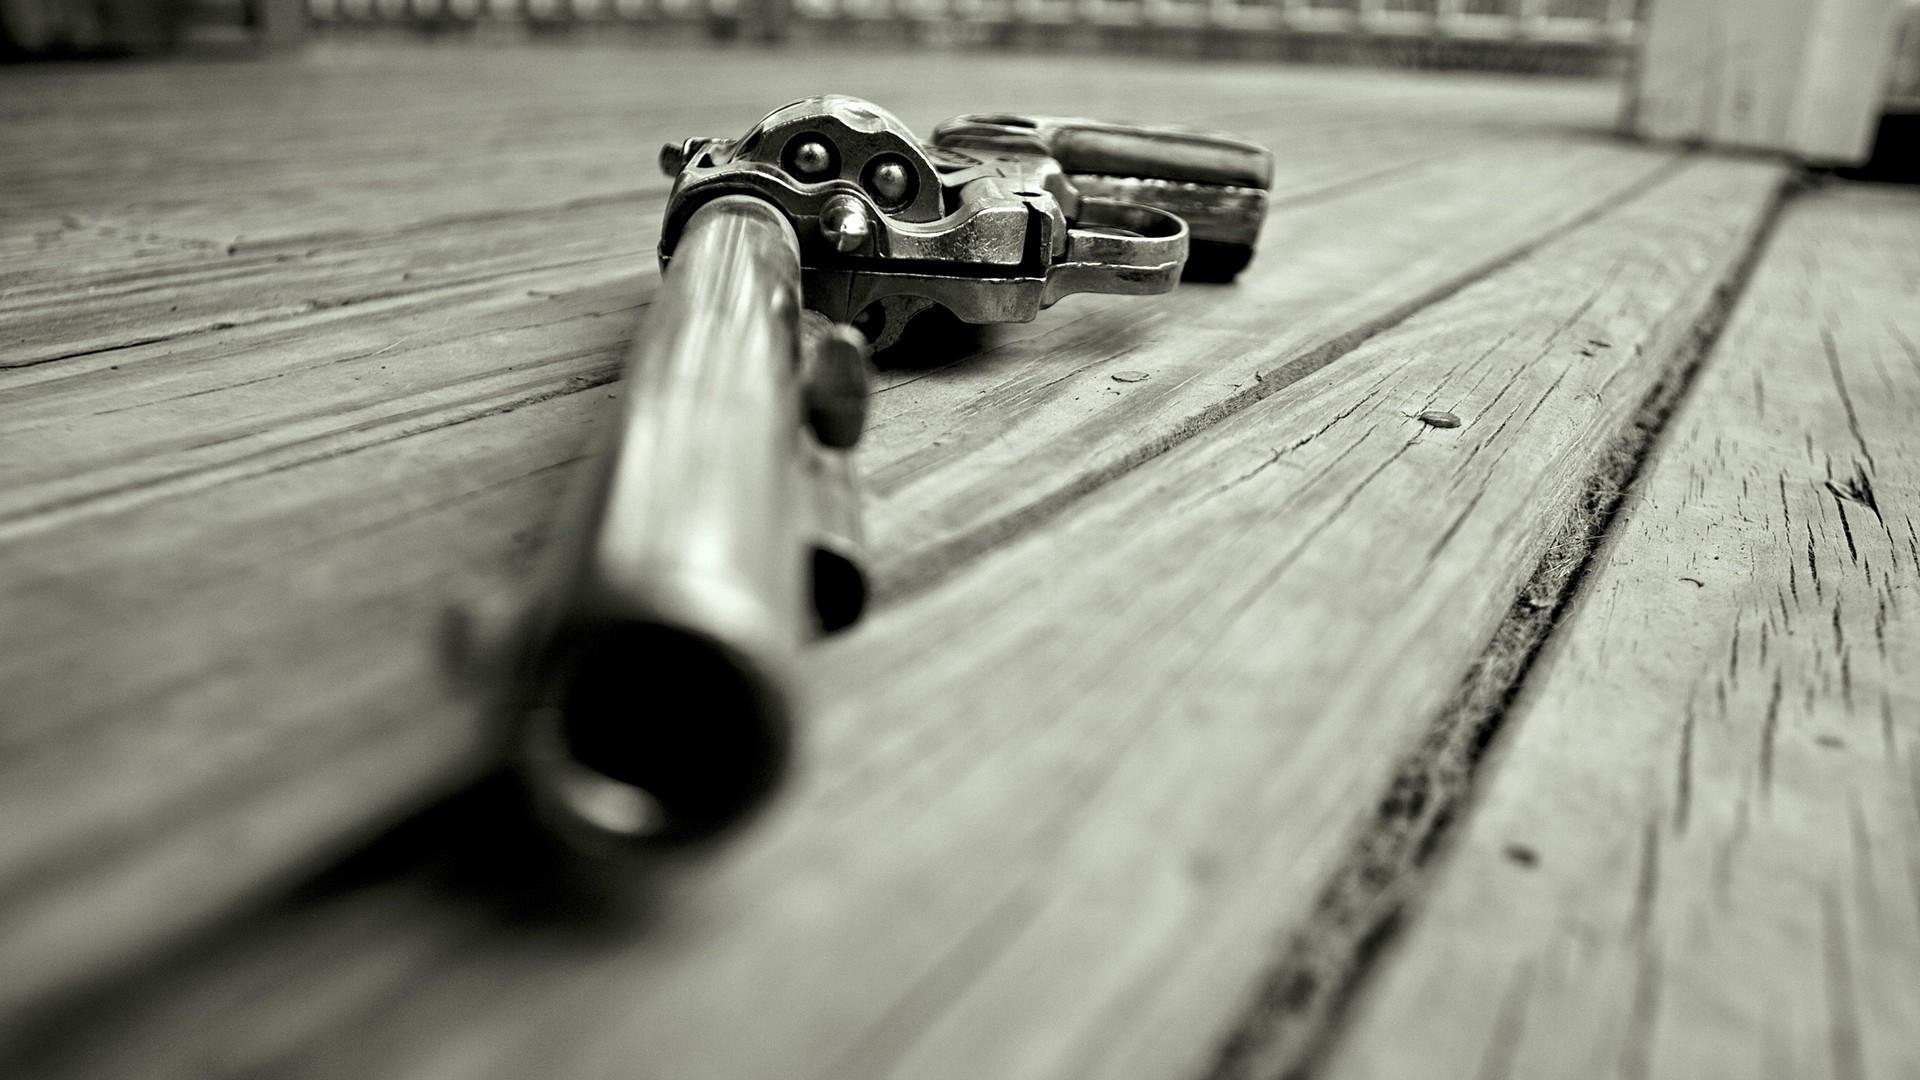 Hd wallpaper gun -  Revolver Wallpaper